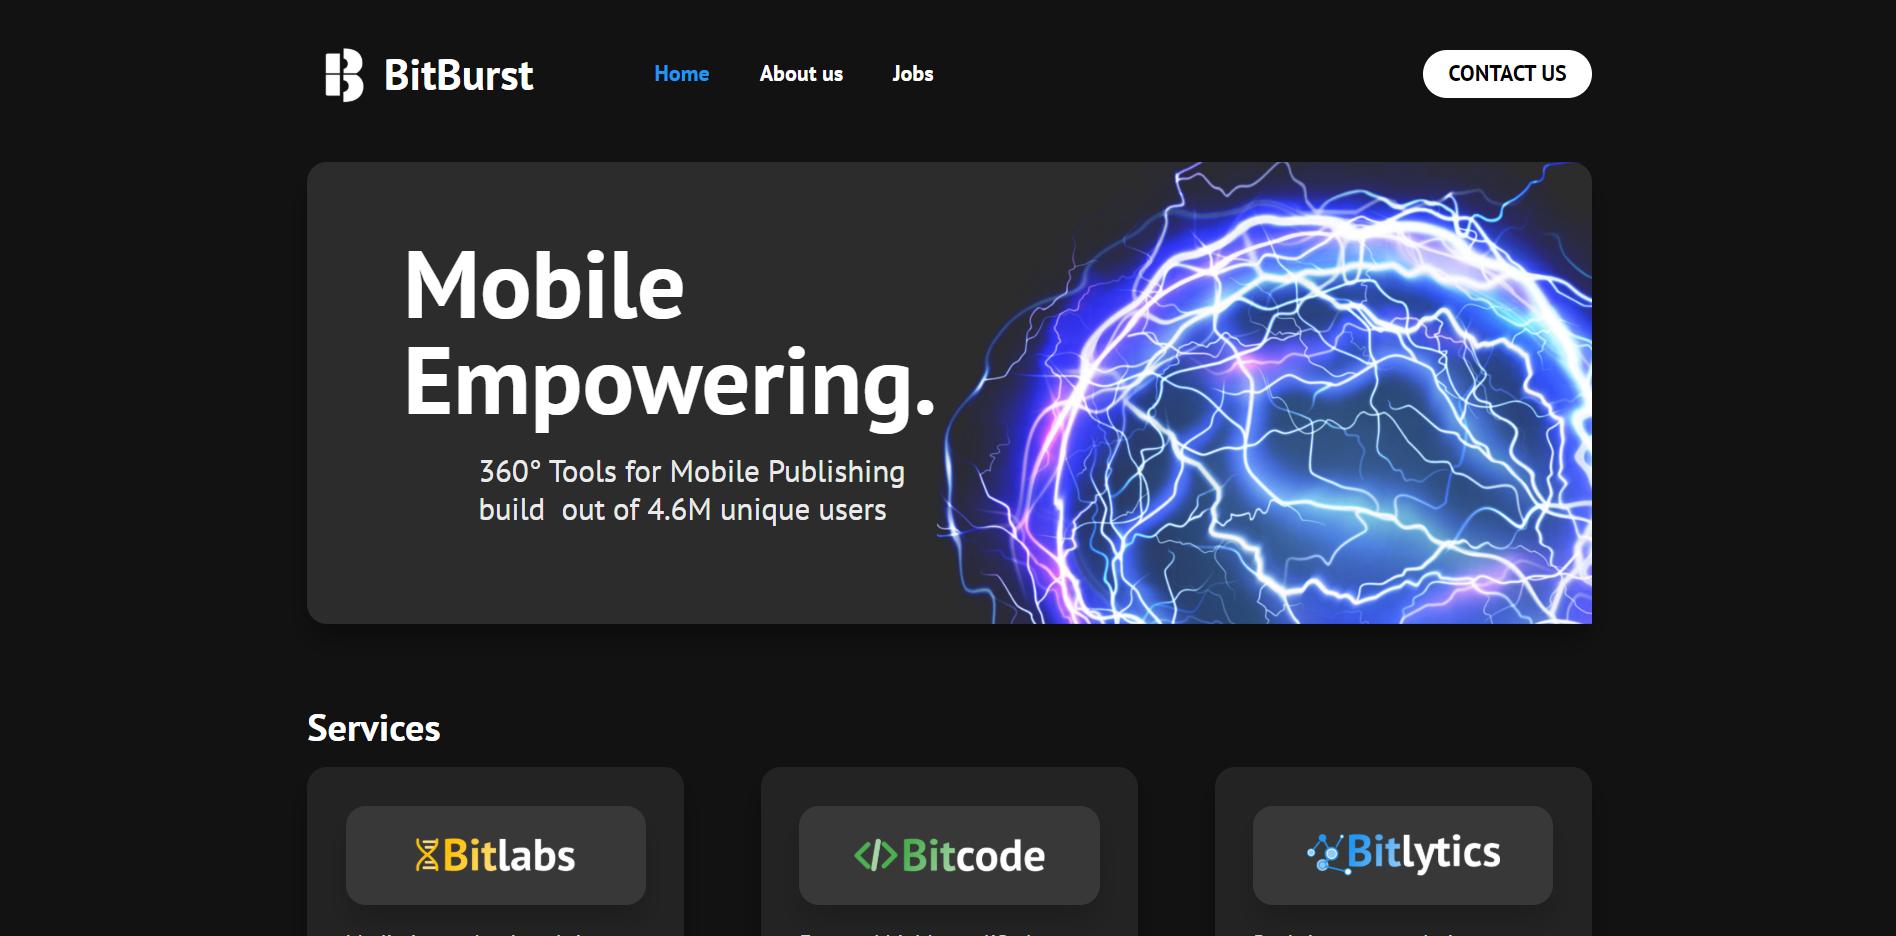 BitBurst website